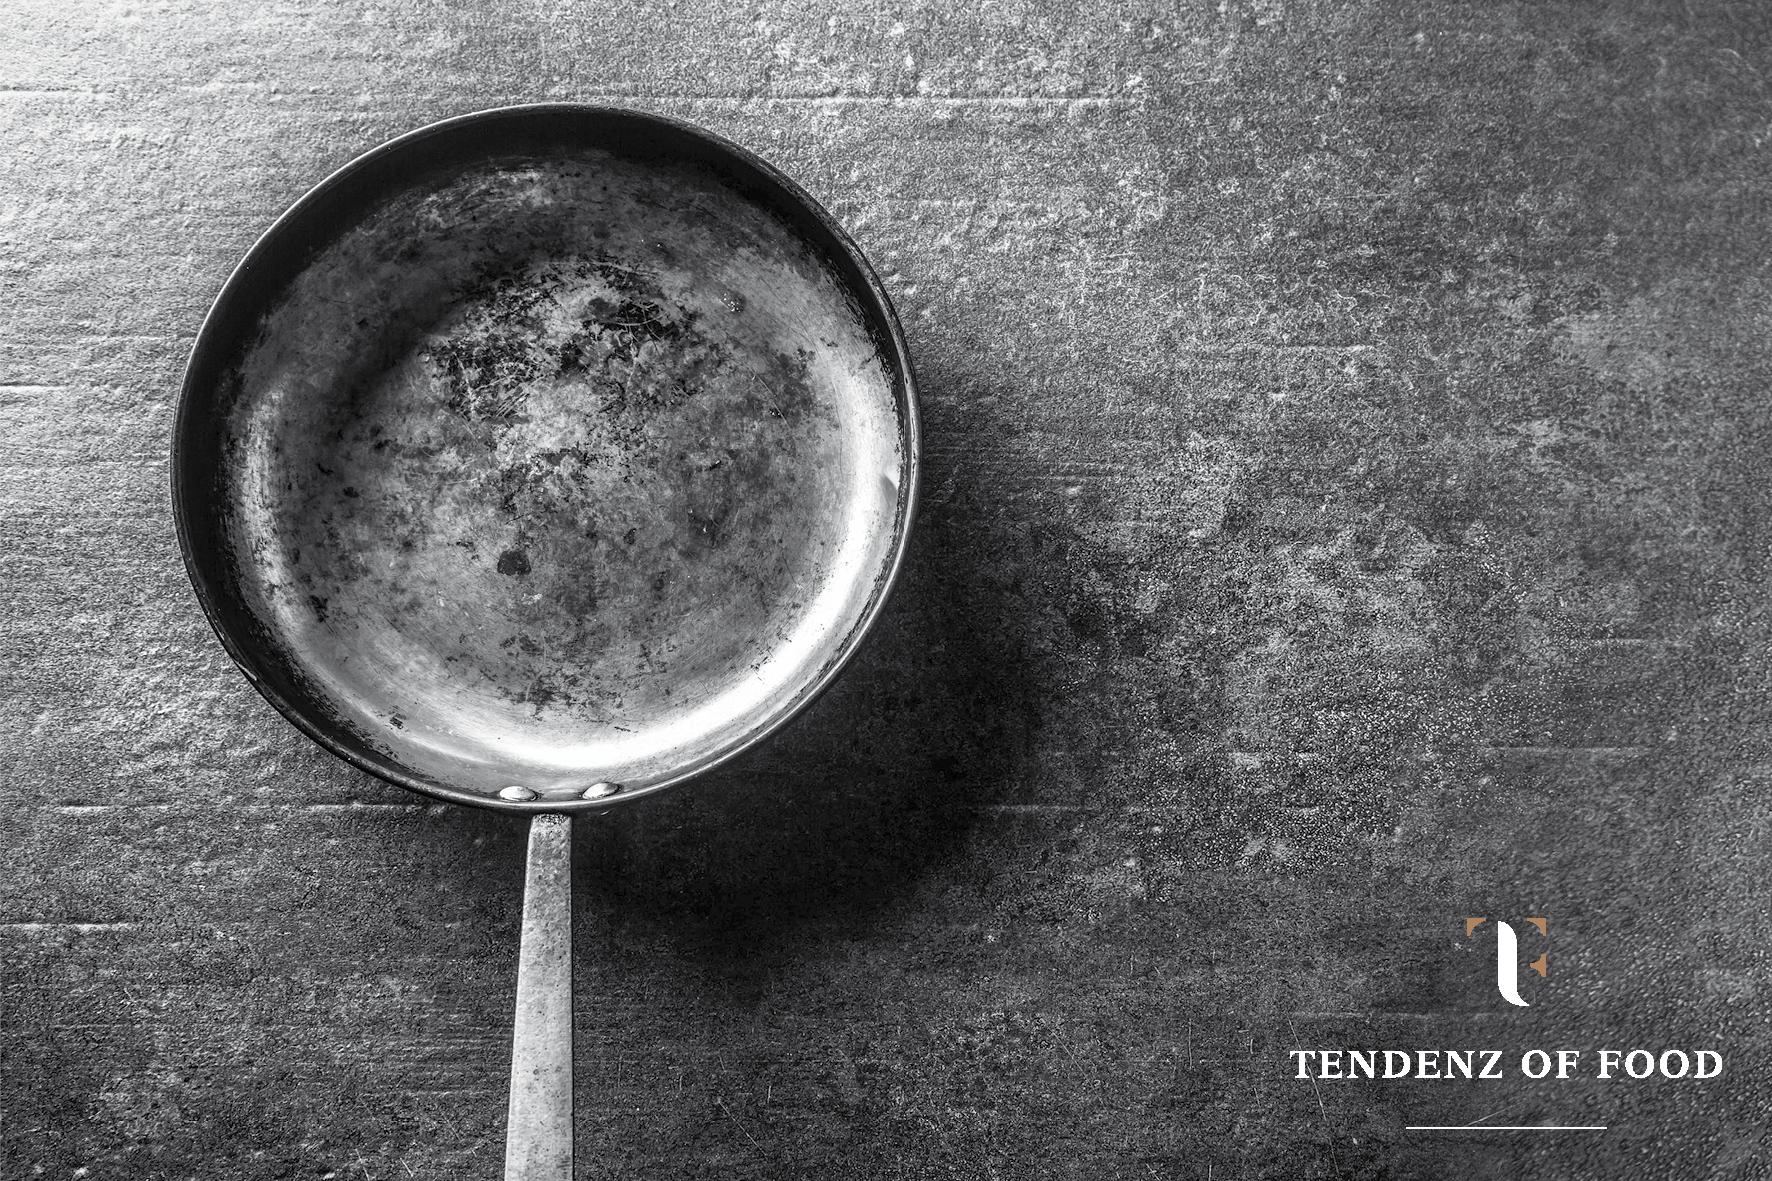 Tendenz of Food2